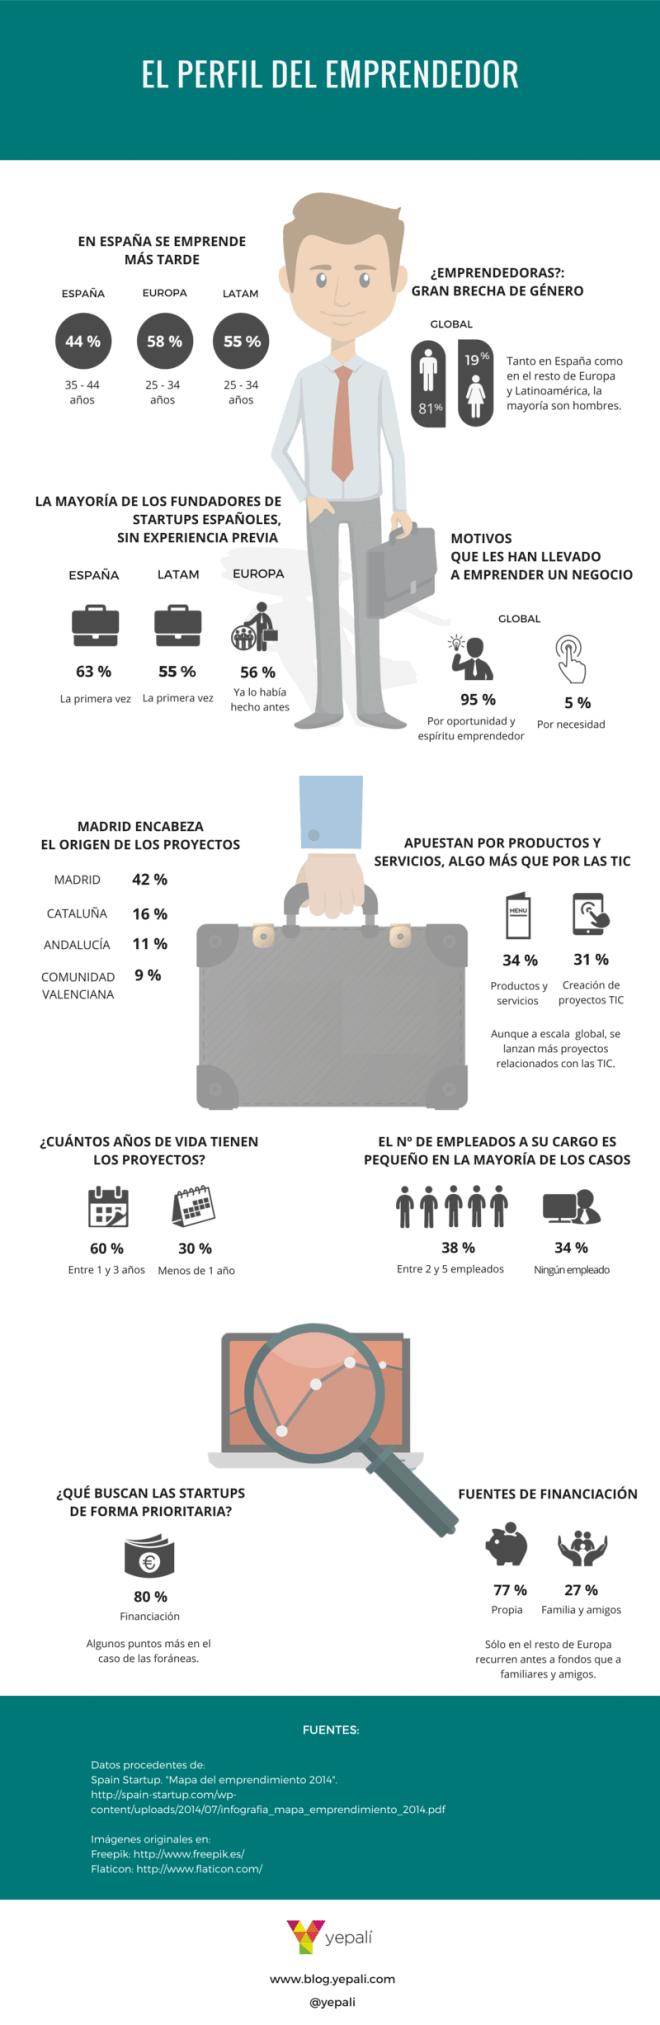 El perfil del emprendedor español